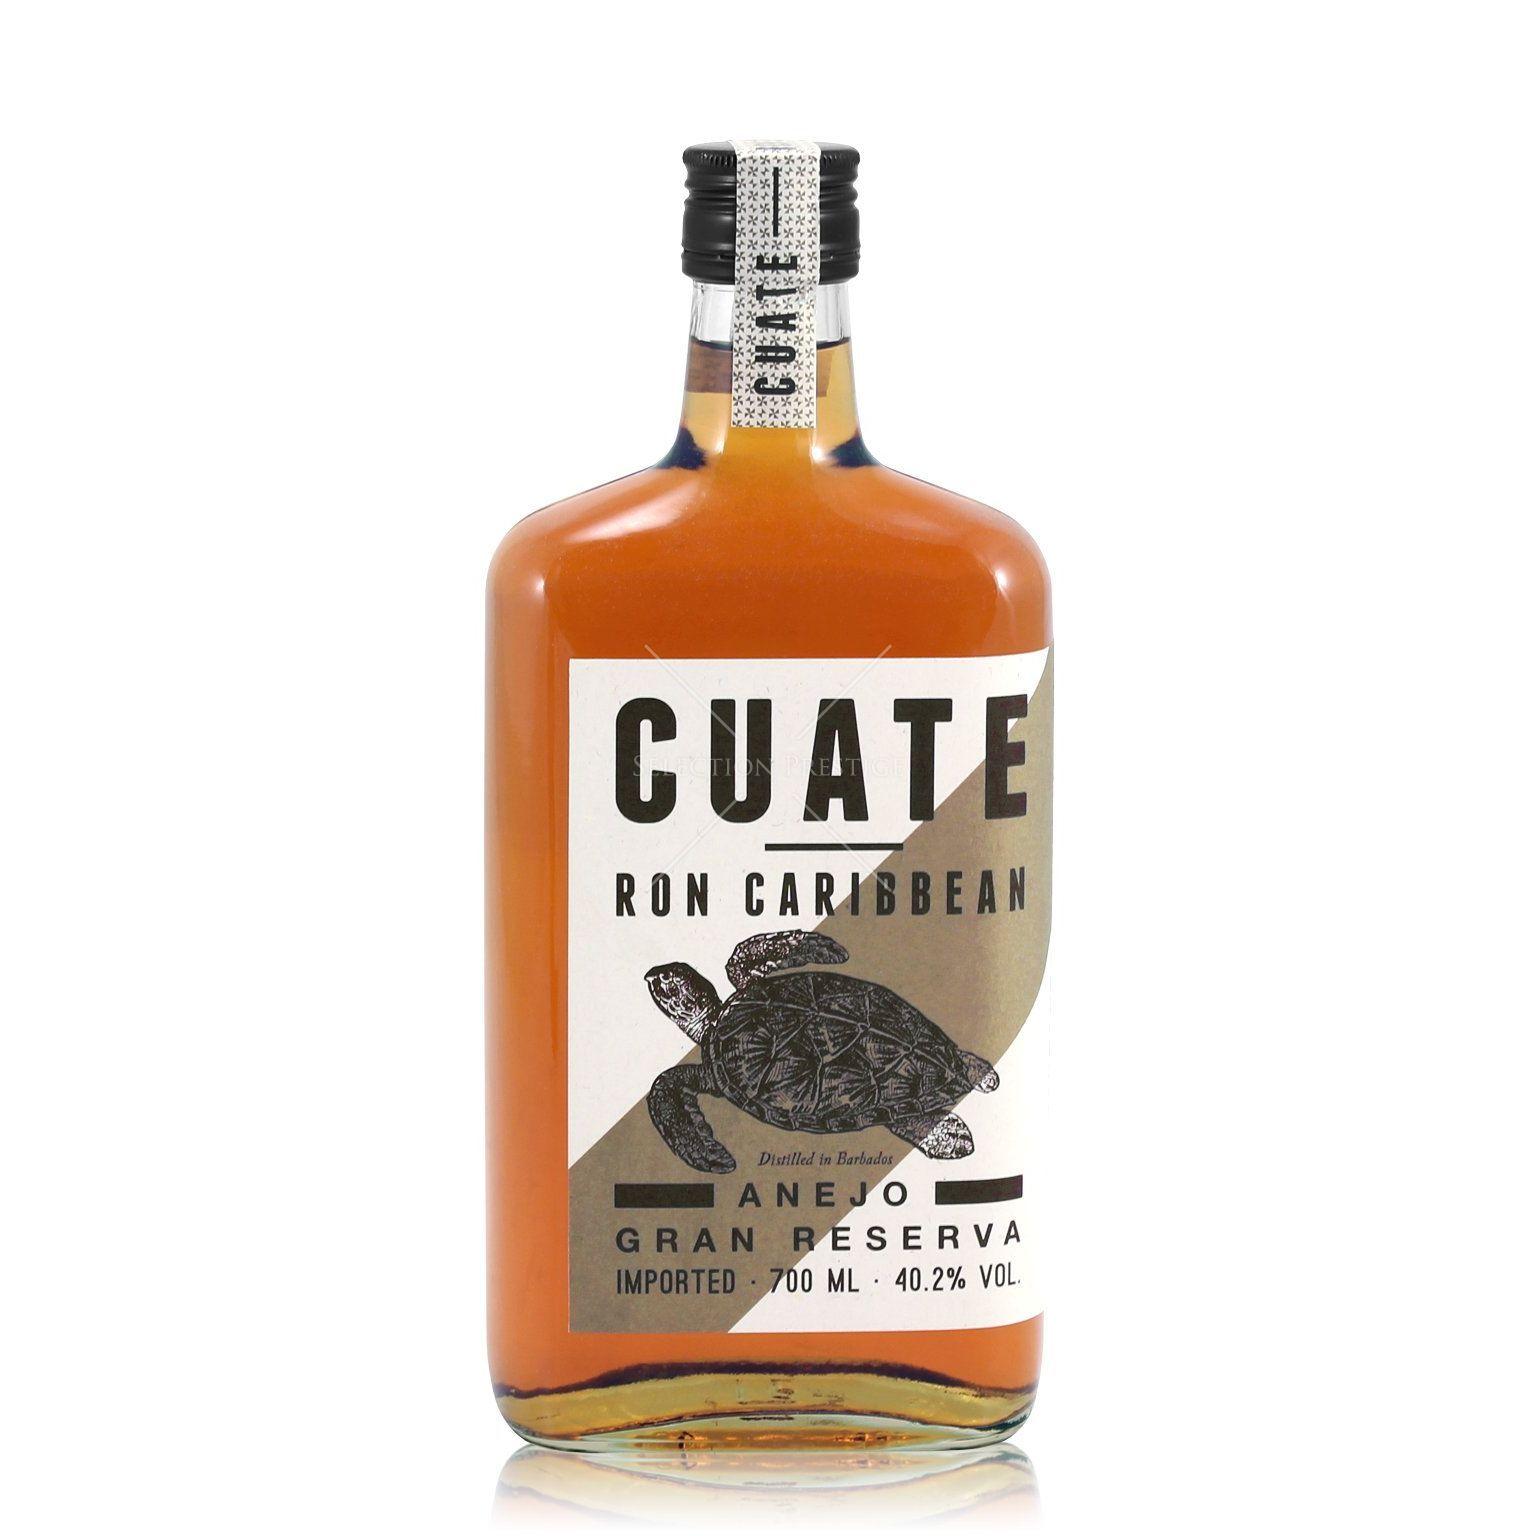 Rum Cuate 13 0,7L (40,2 Vol.) Rhum, Rhum brun et Bouteille